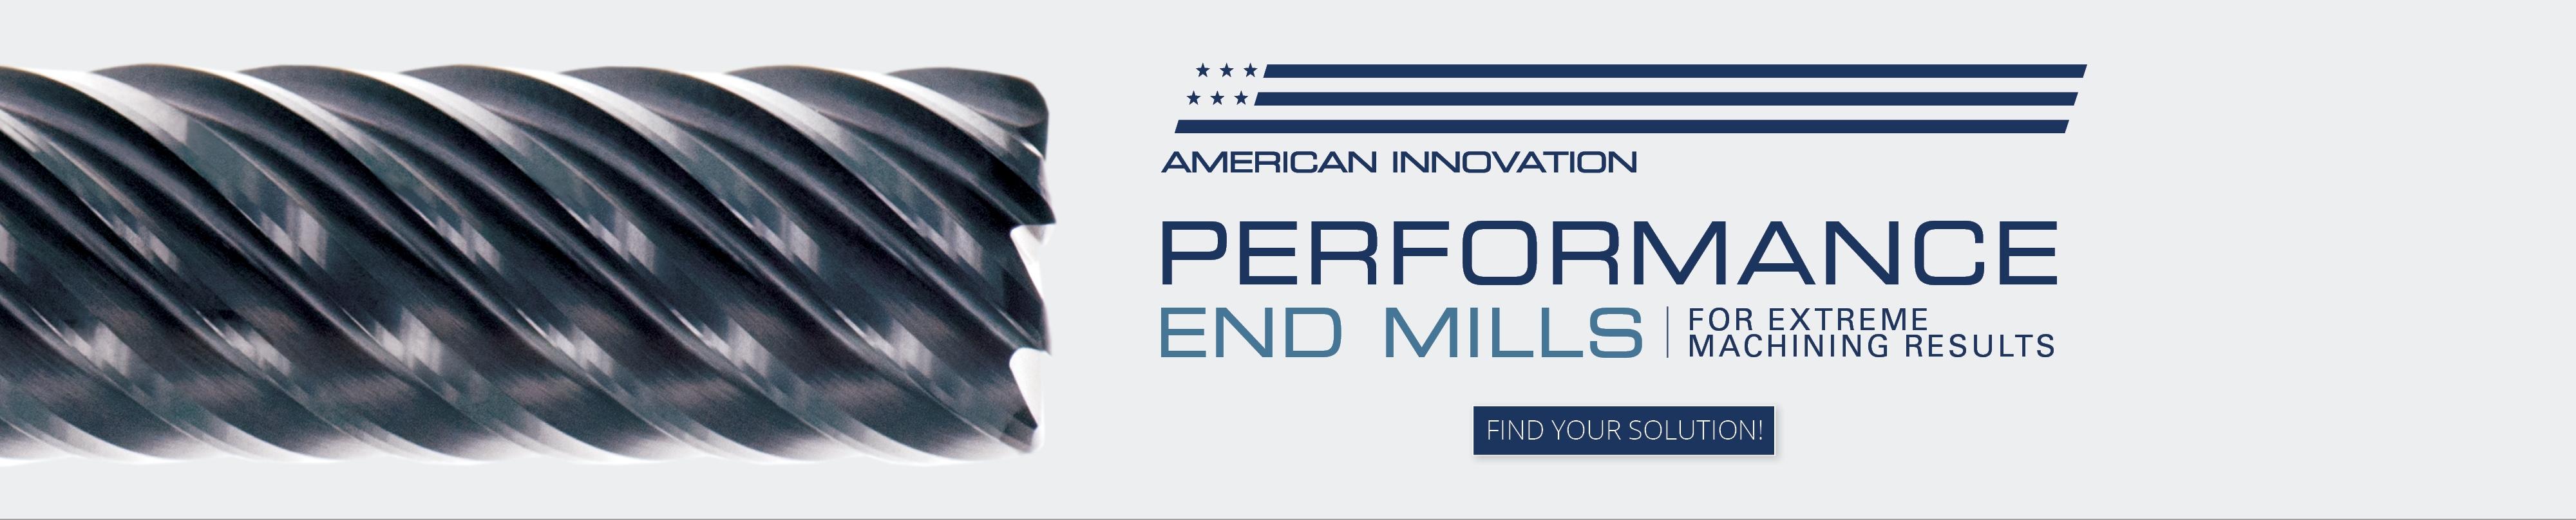 Performance End Mills Banner